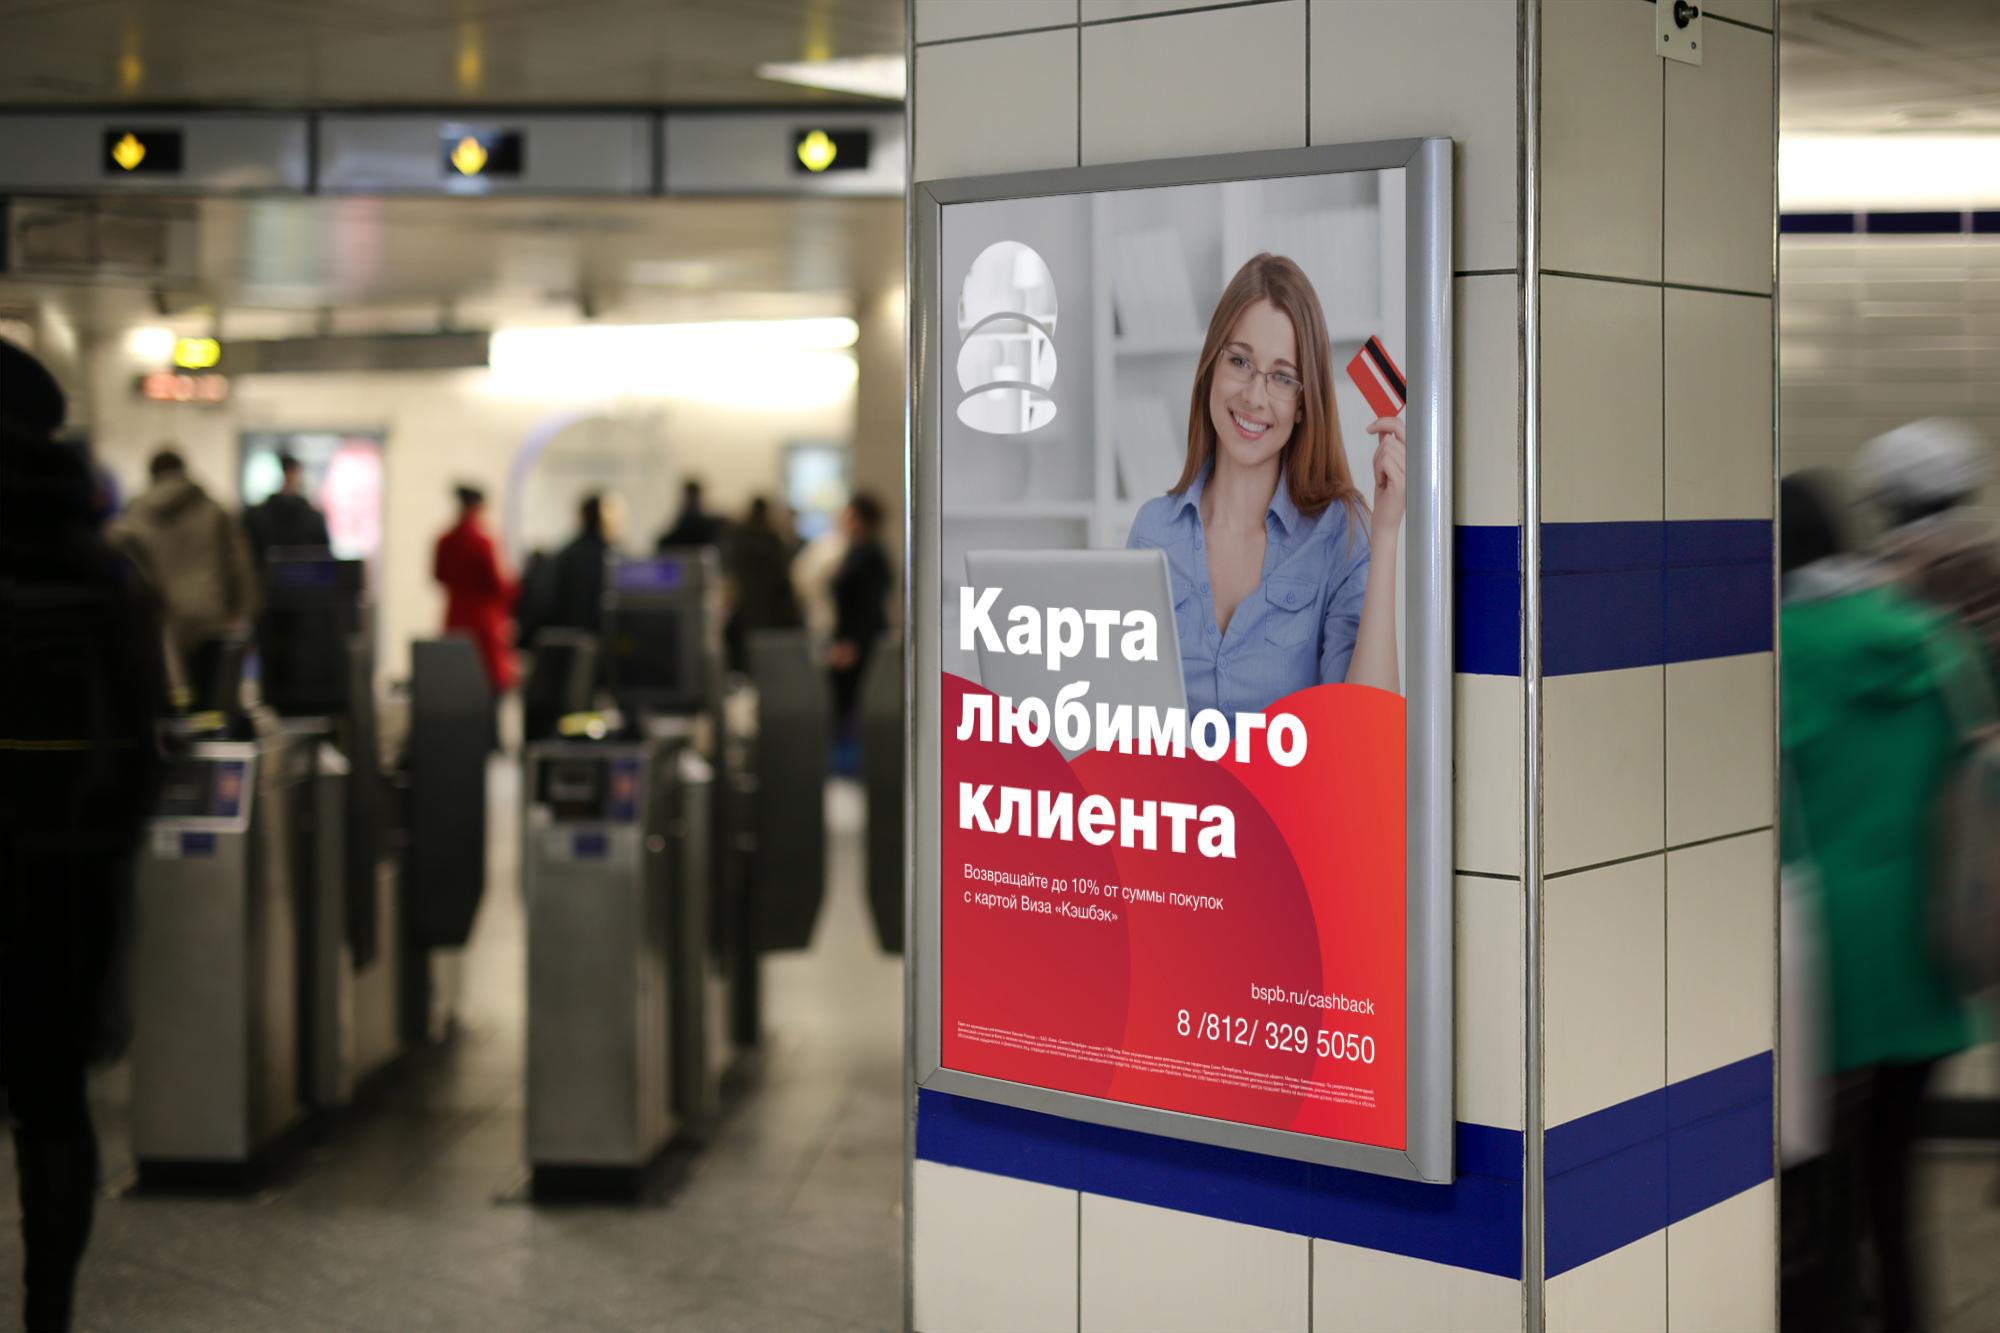 Фирменный стиль Банка Санкт-Петербург